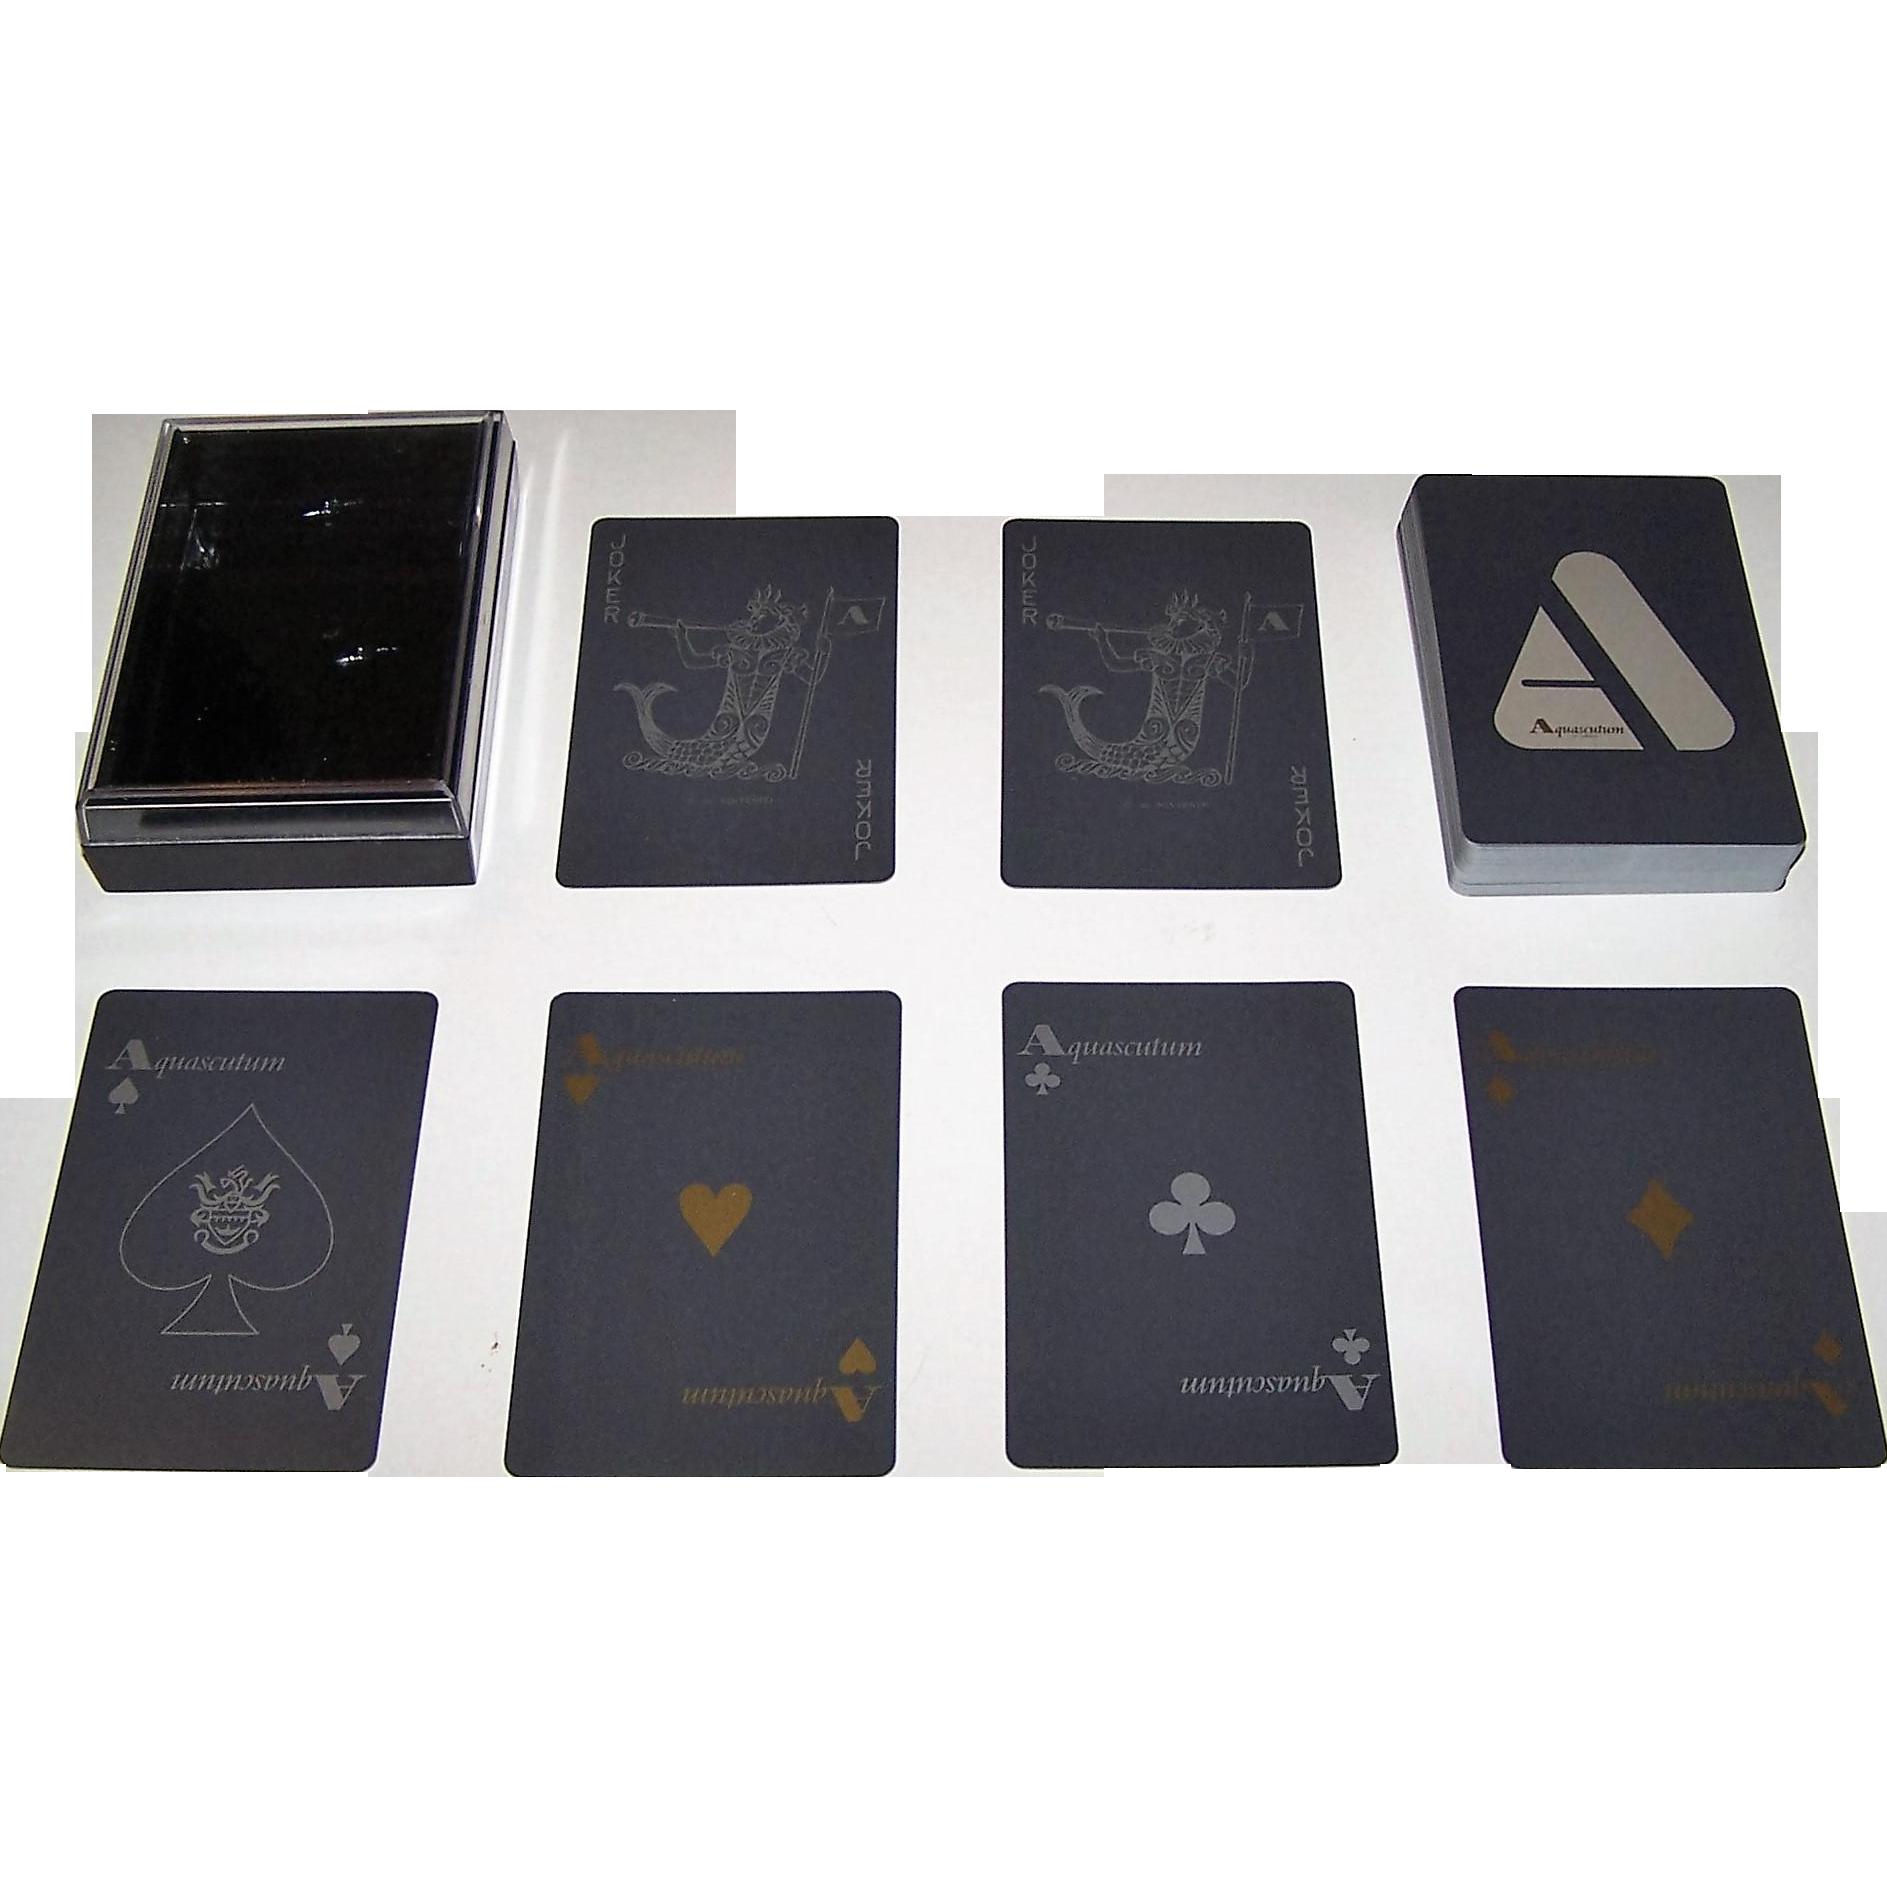 "Nintendo ""Aquascutum"" Playing Cards, c.1983"